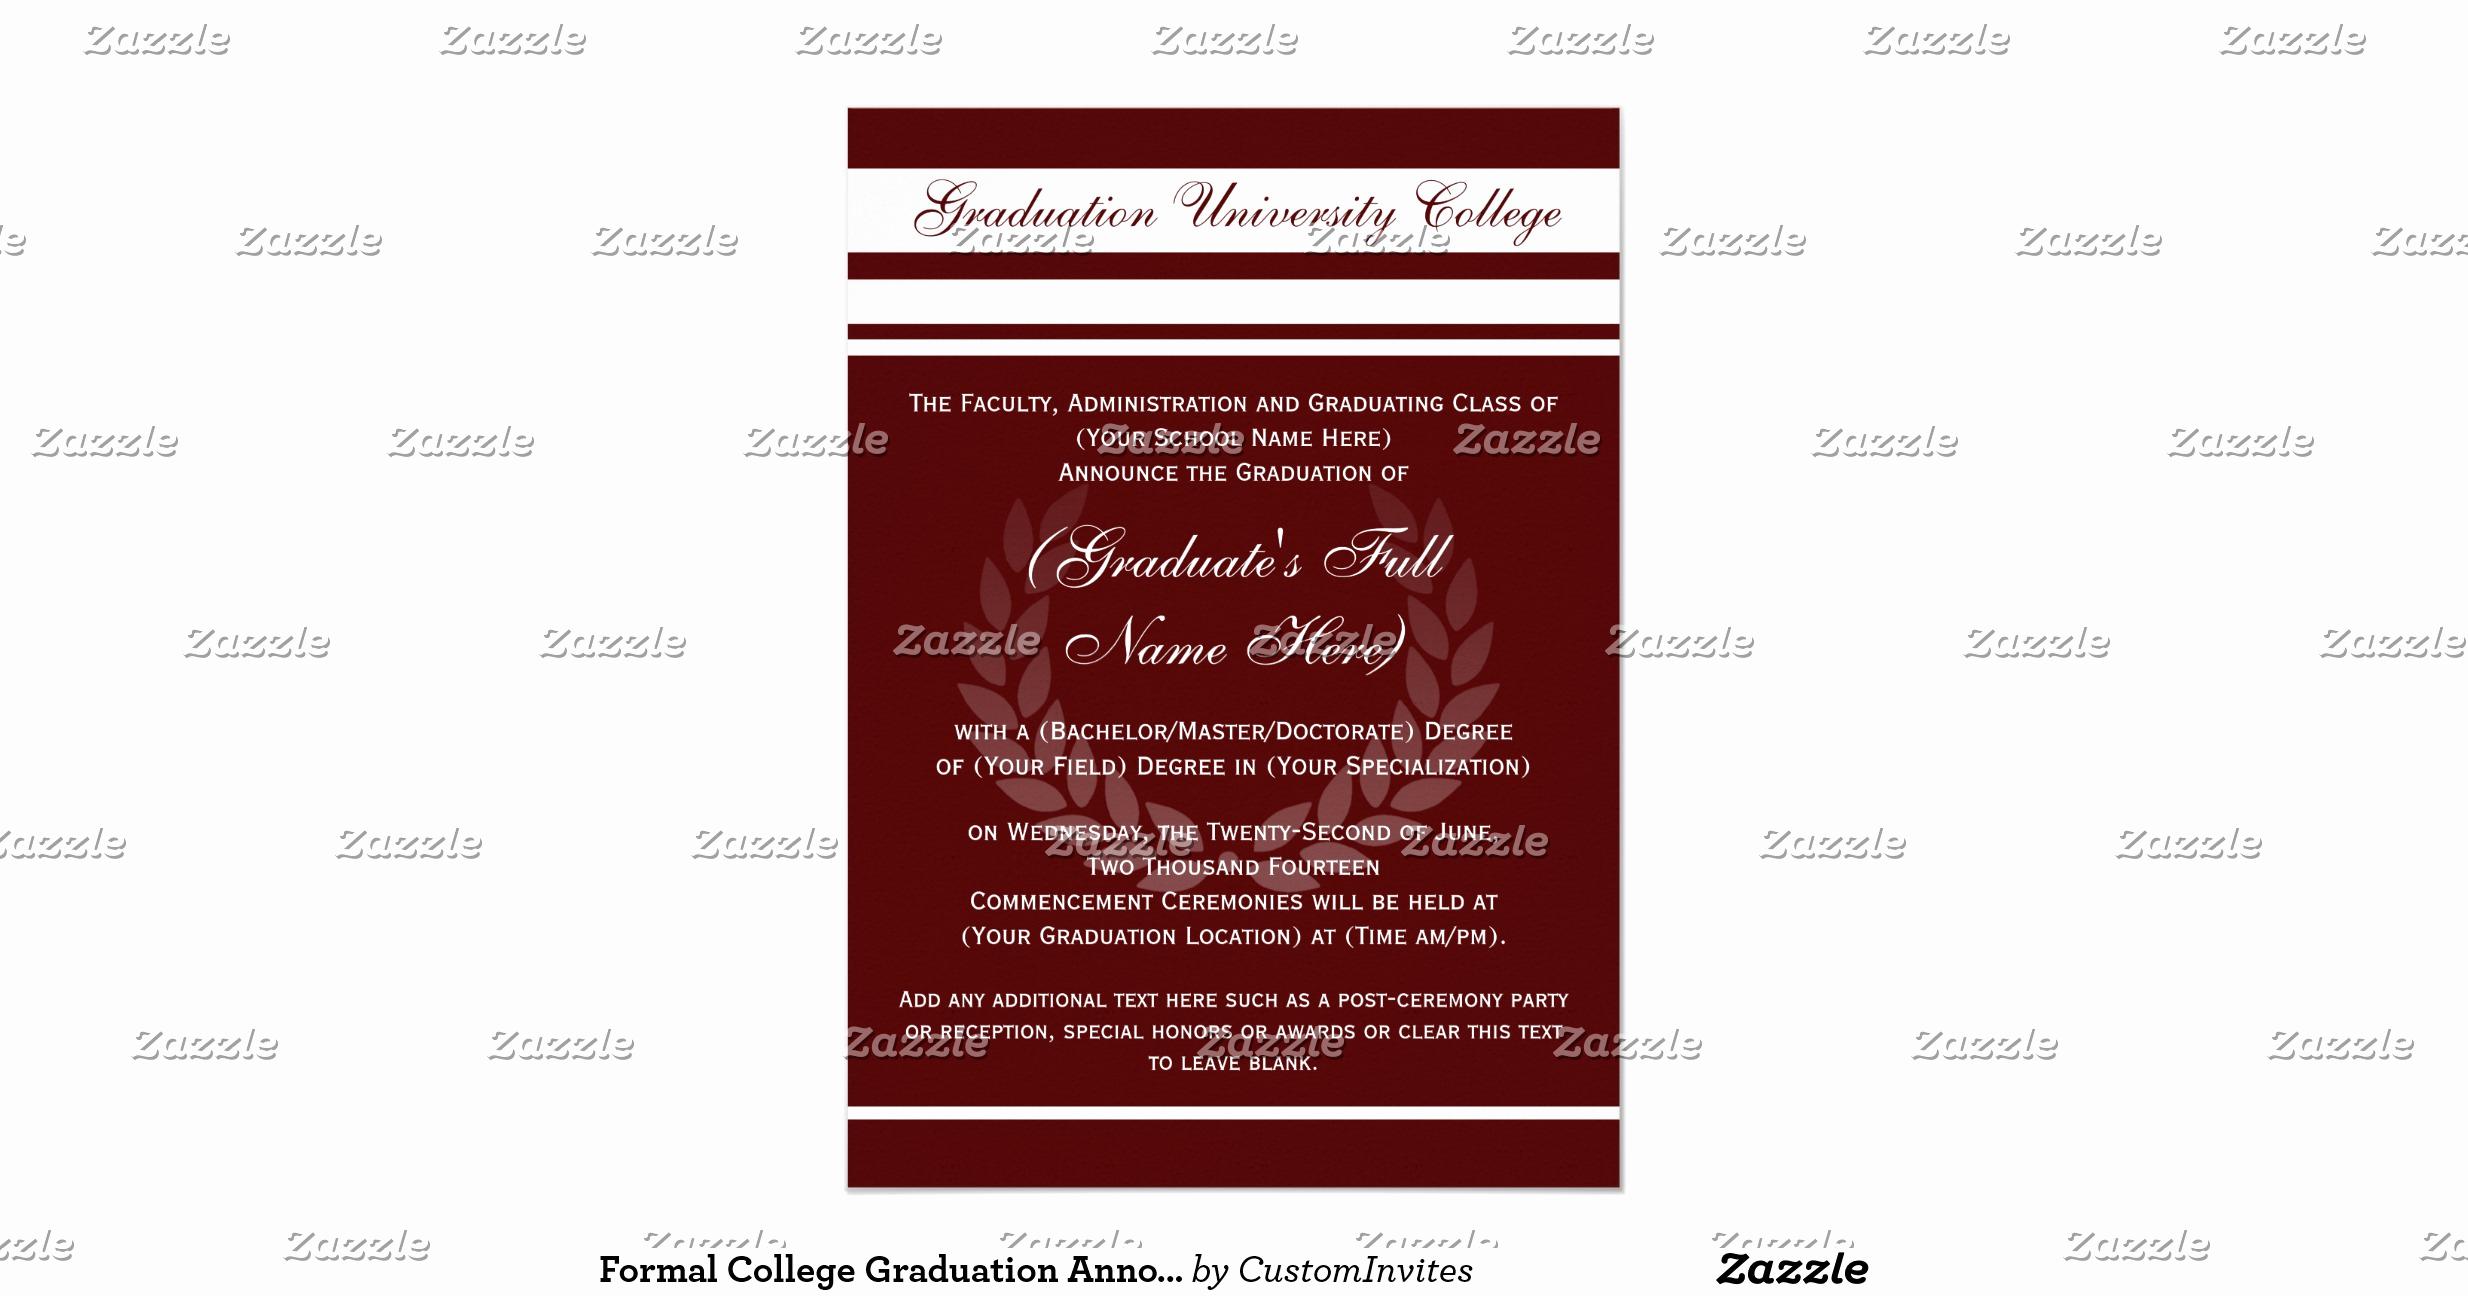 Formal Graduation Invitation Wording Luxury formal College Graduation Announcements Maroon